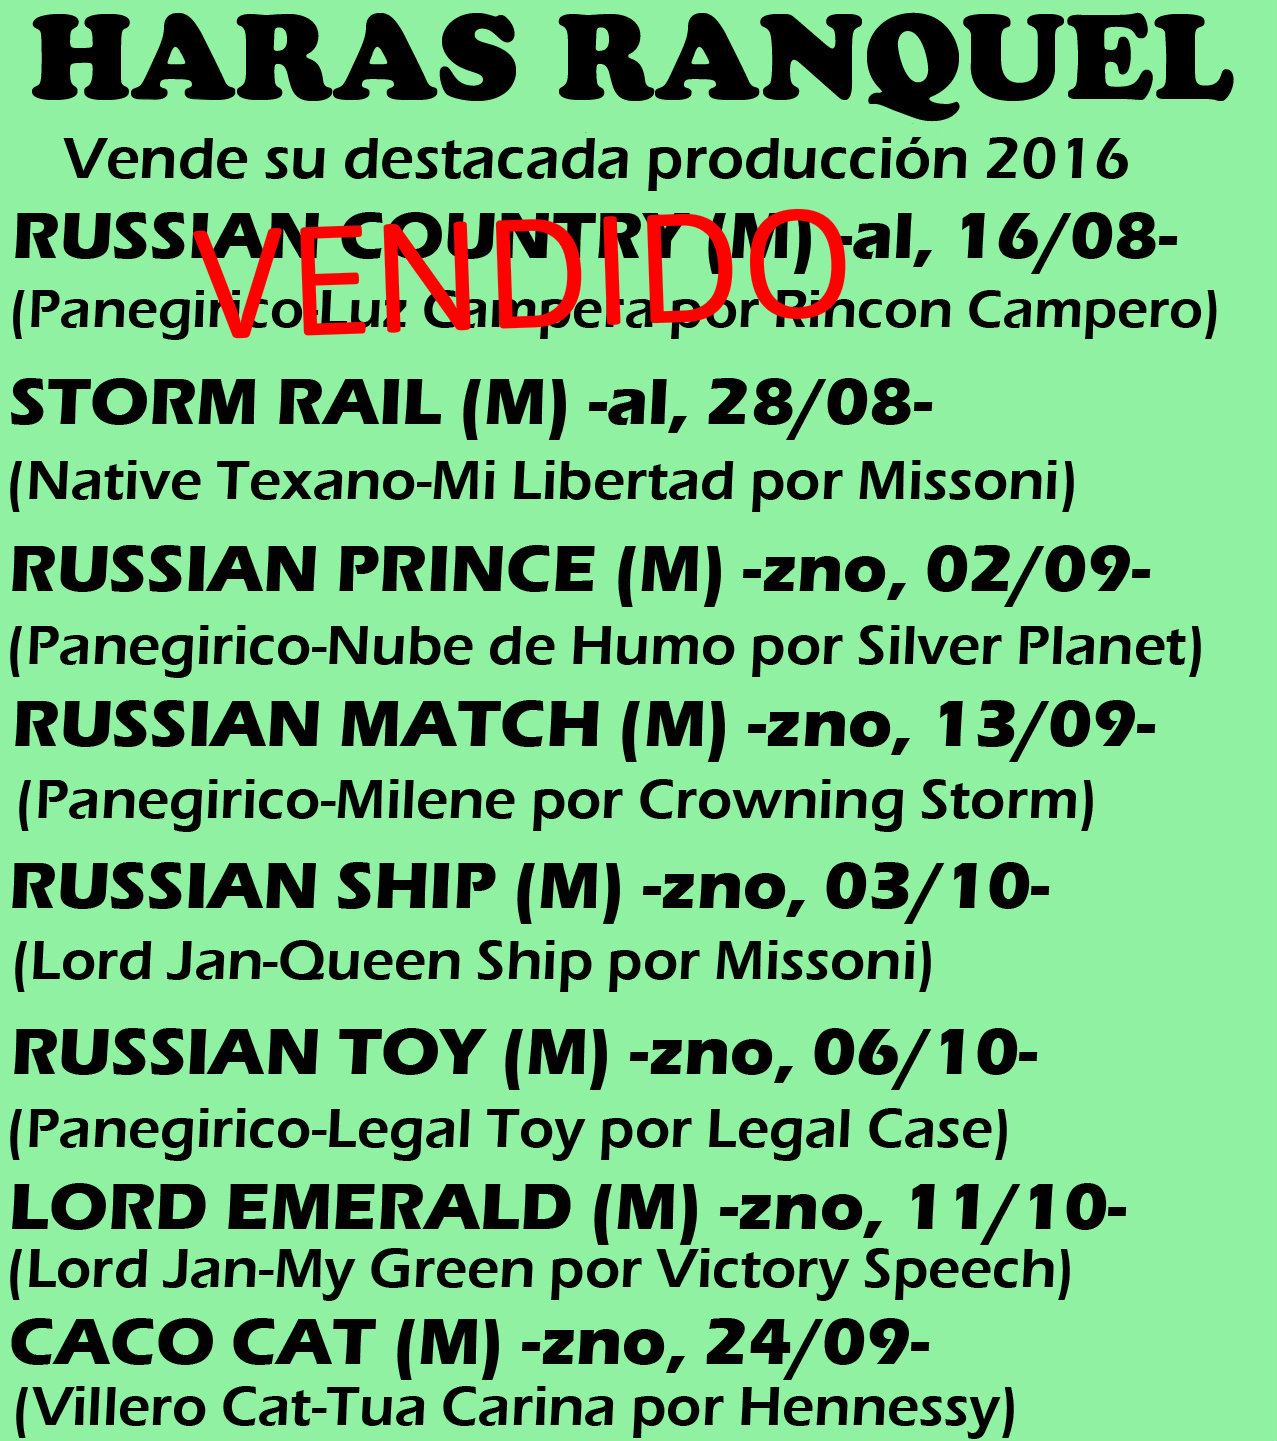 HS RANQUEL PROD 2016 1